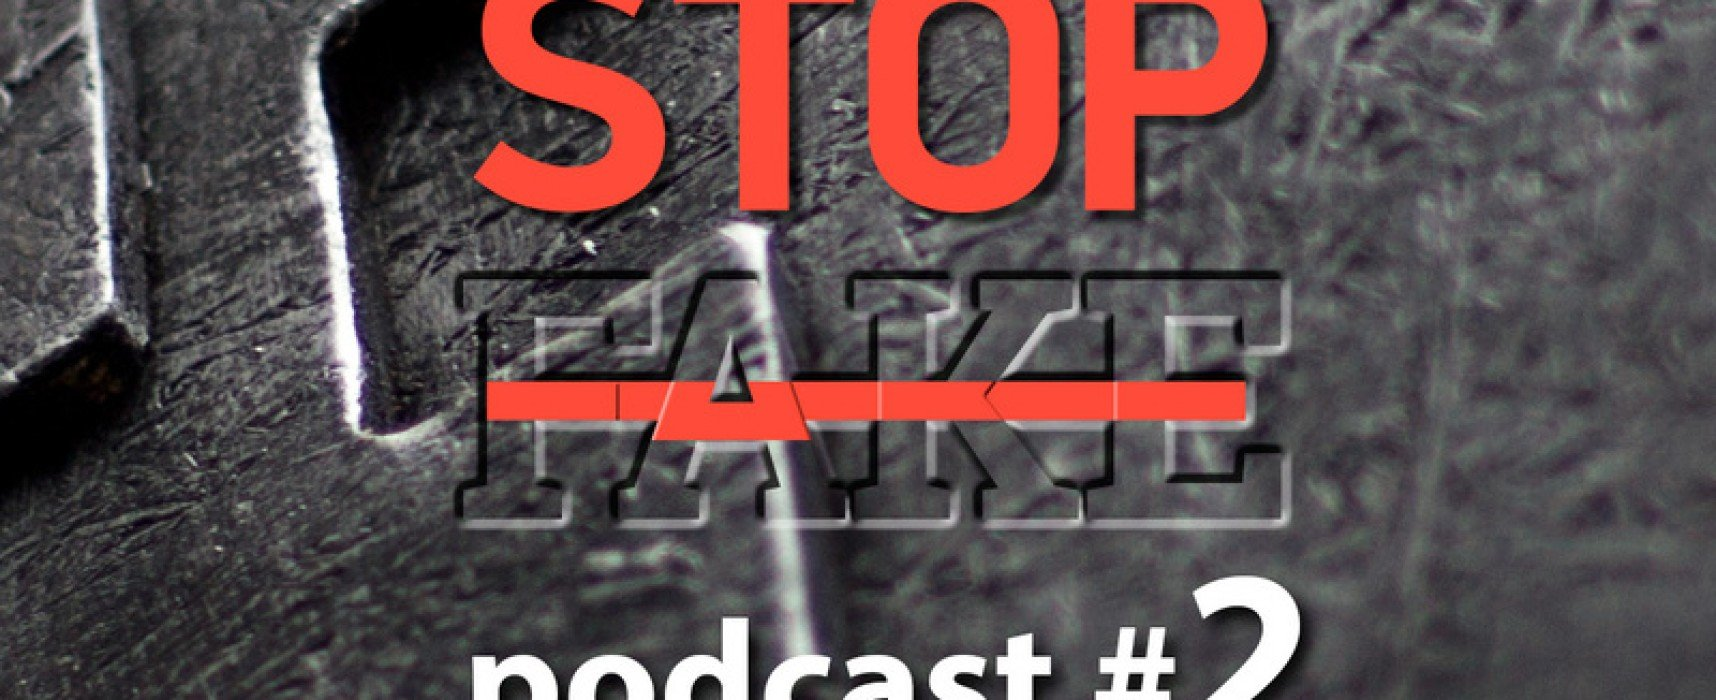 StopFake podcast #2